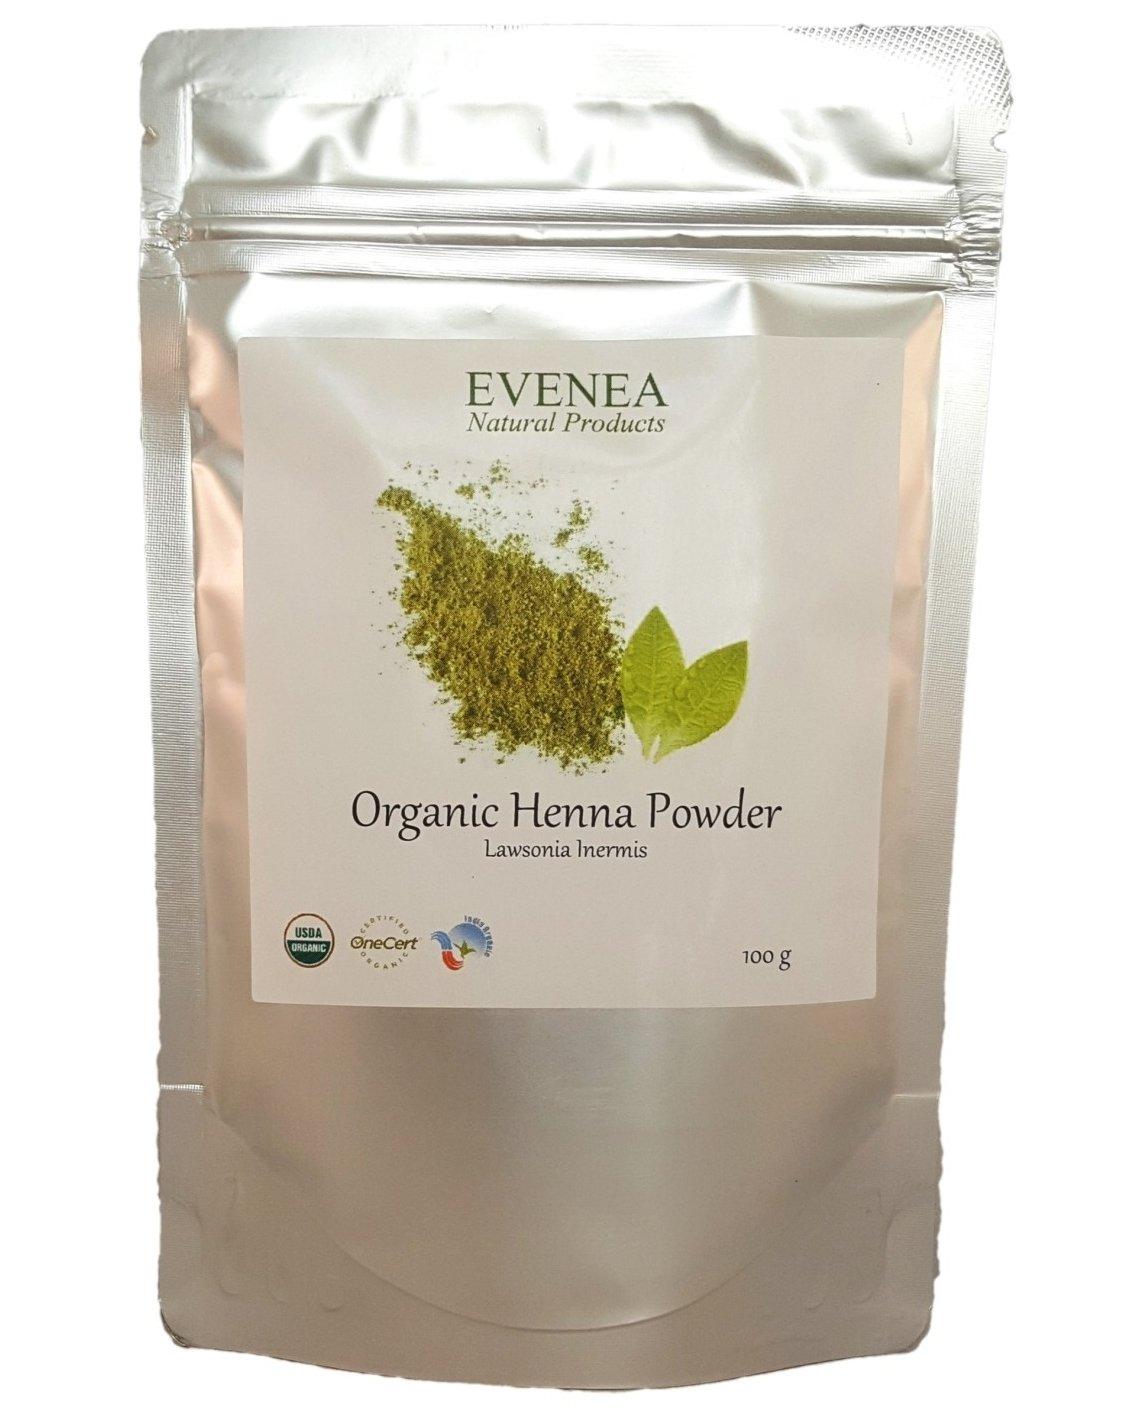 100g Organic Rajasthani Henna Powder Triple-Sifted Body Art Quality Evenea